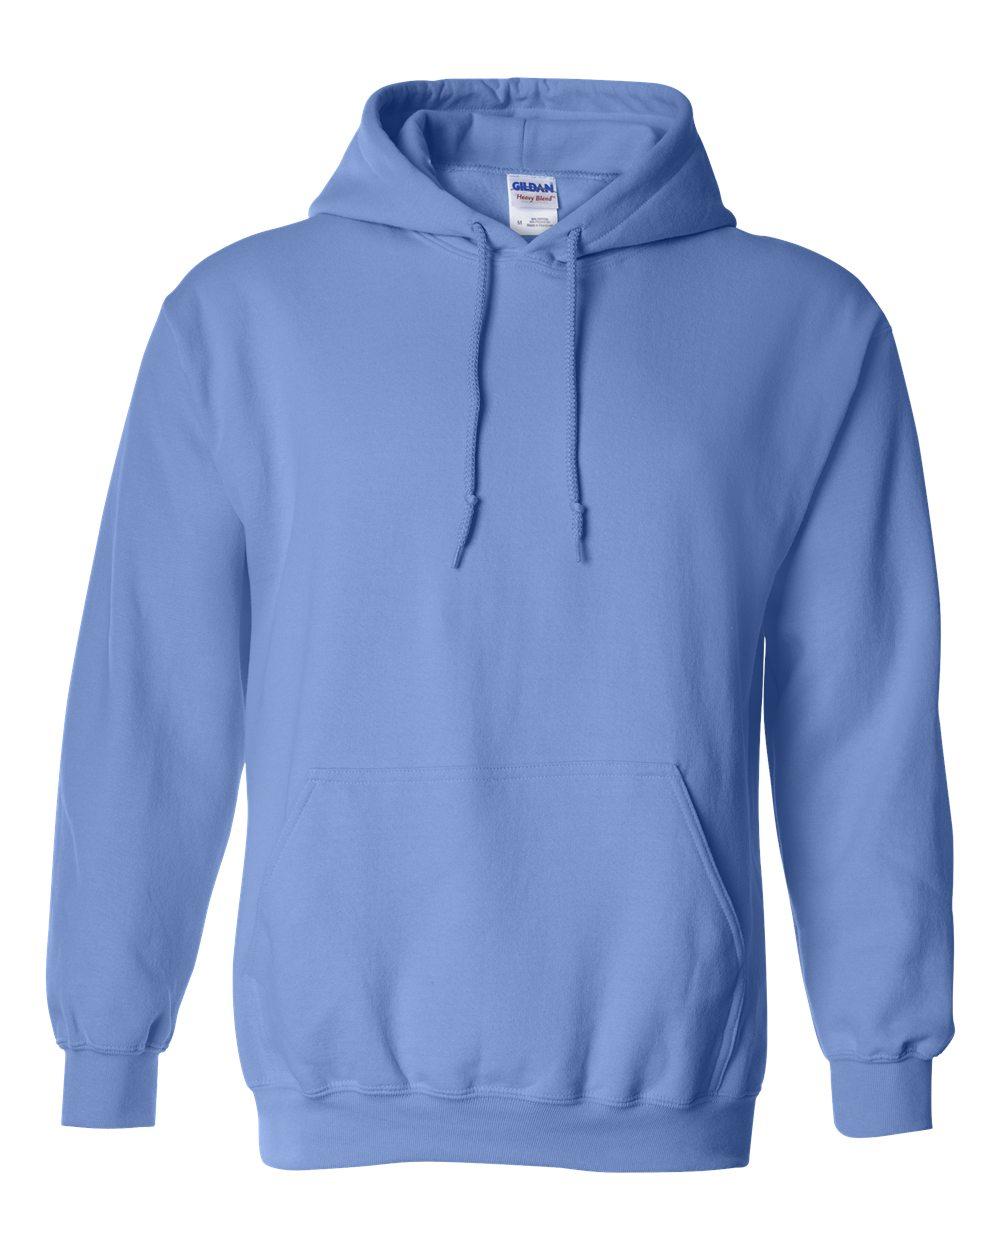 Gildan-Mens-Blank-Hoodie-Heavy-Blend-Hooded-Sweatshirt-Solid-18500-up-to-5XL thumbnail 15